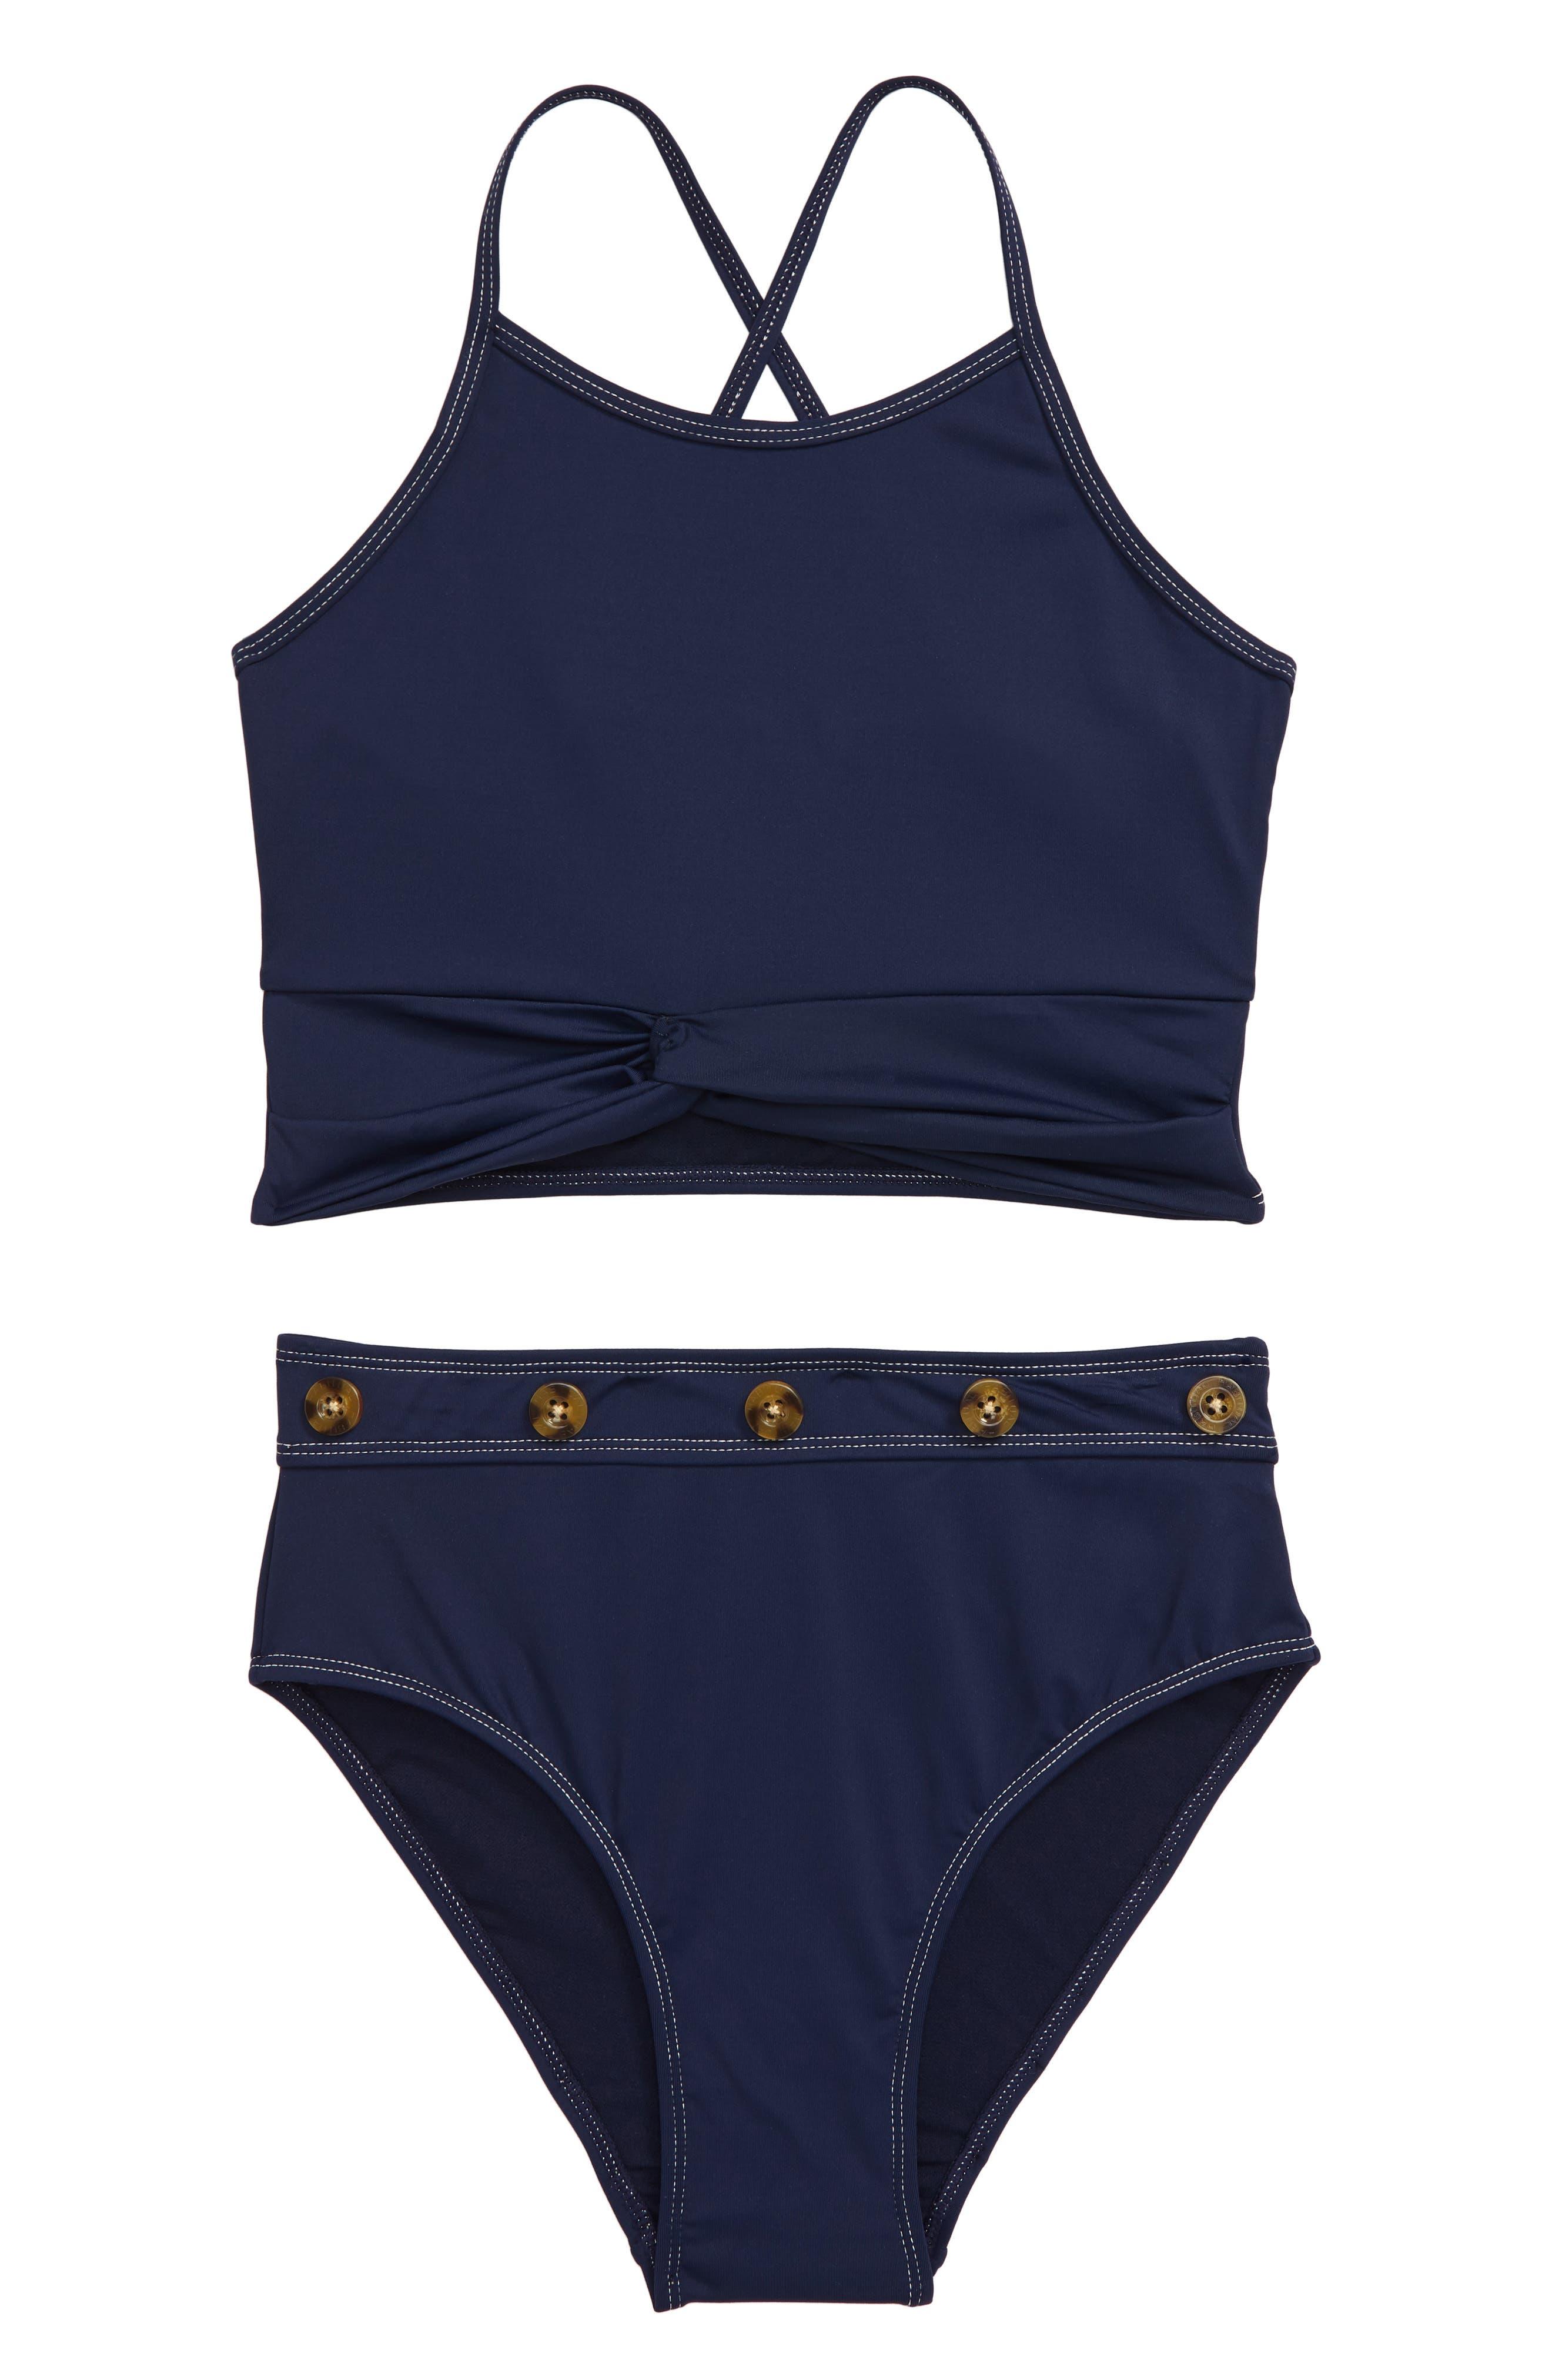 Image of Habitual Kids Contrast Button 2-Piece Swimsuit Set